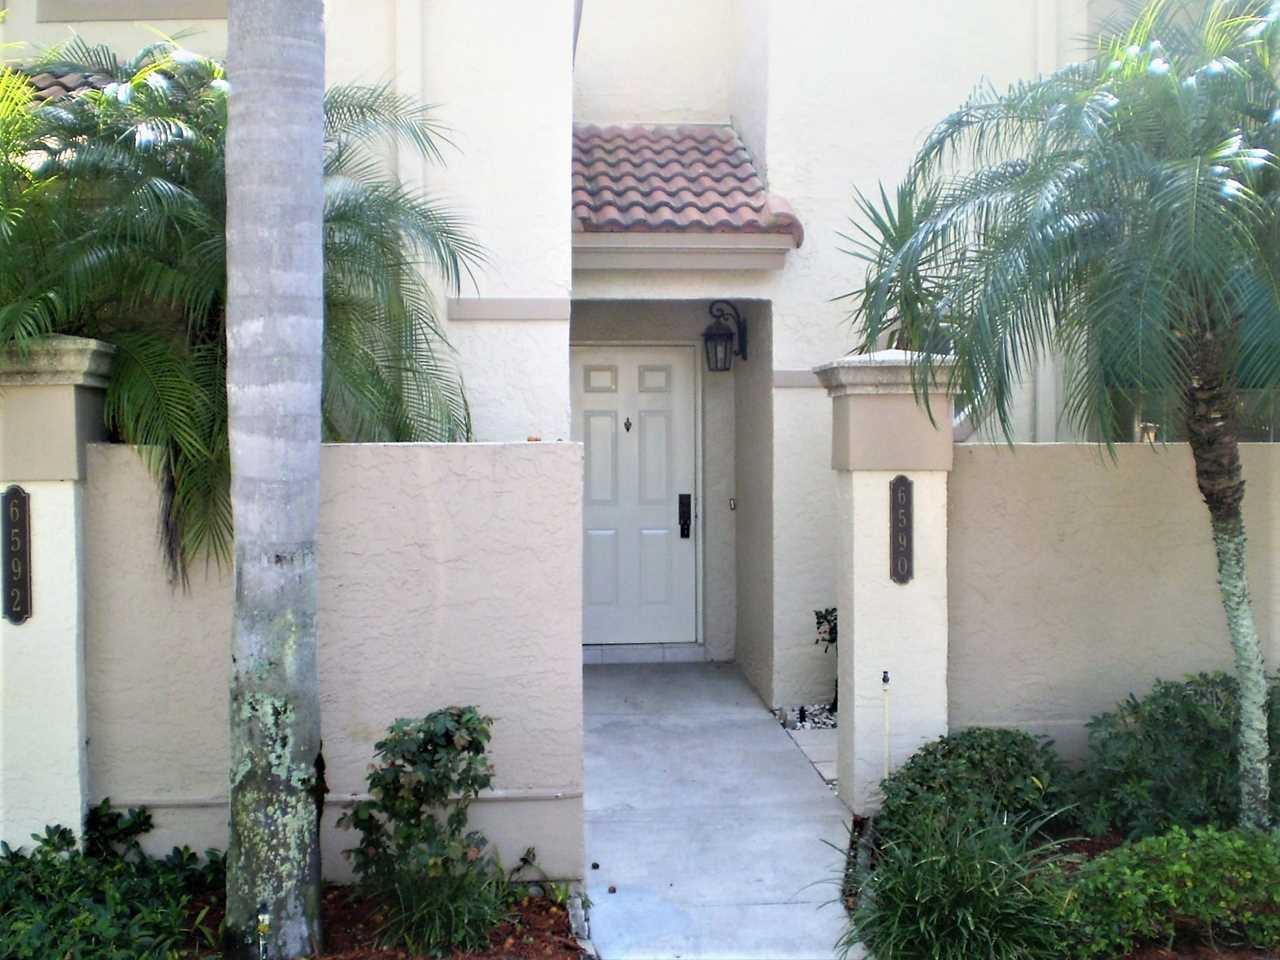 6590 Via Regina Boca Raton, FL 33433 - MLS# RX-10496925   BocaRatonRealEstate.com Photo 1